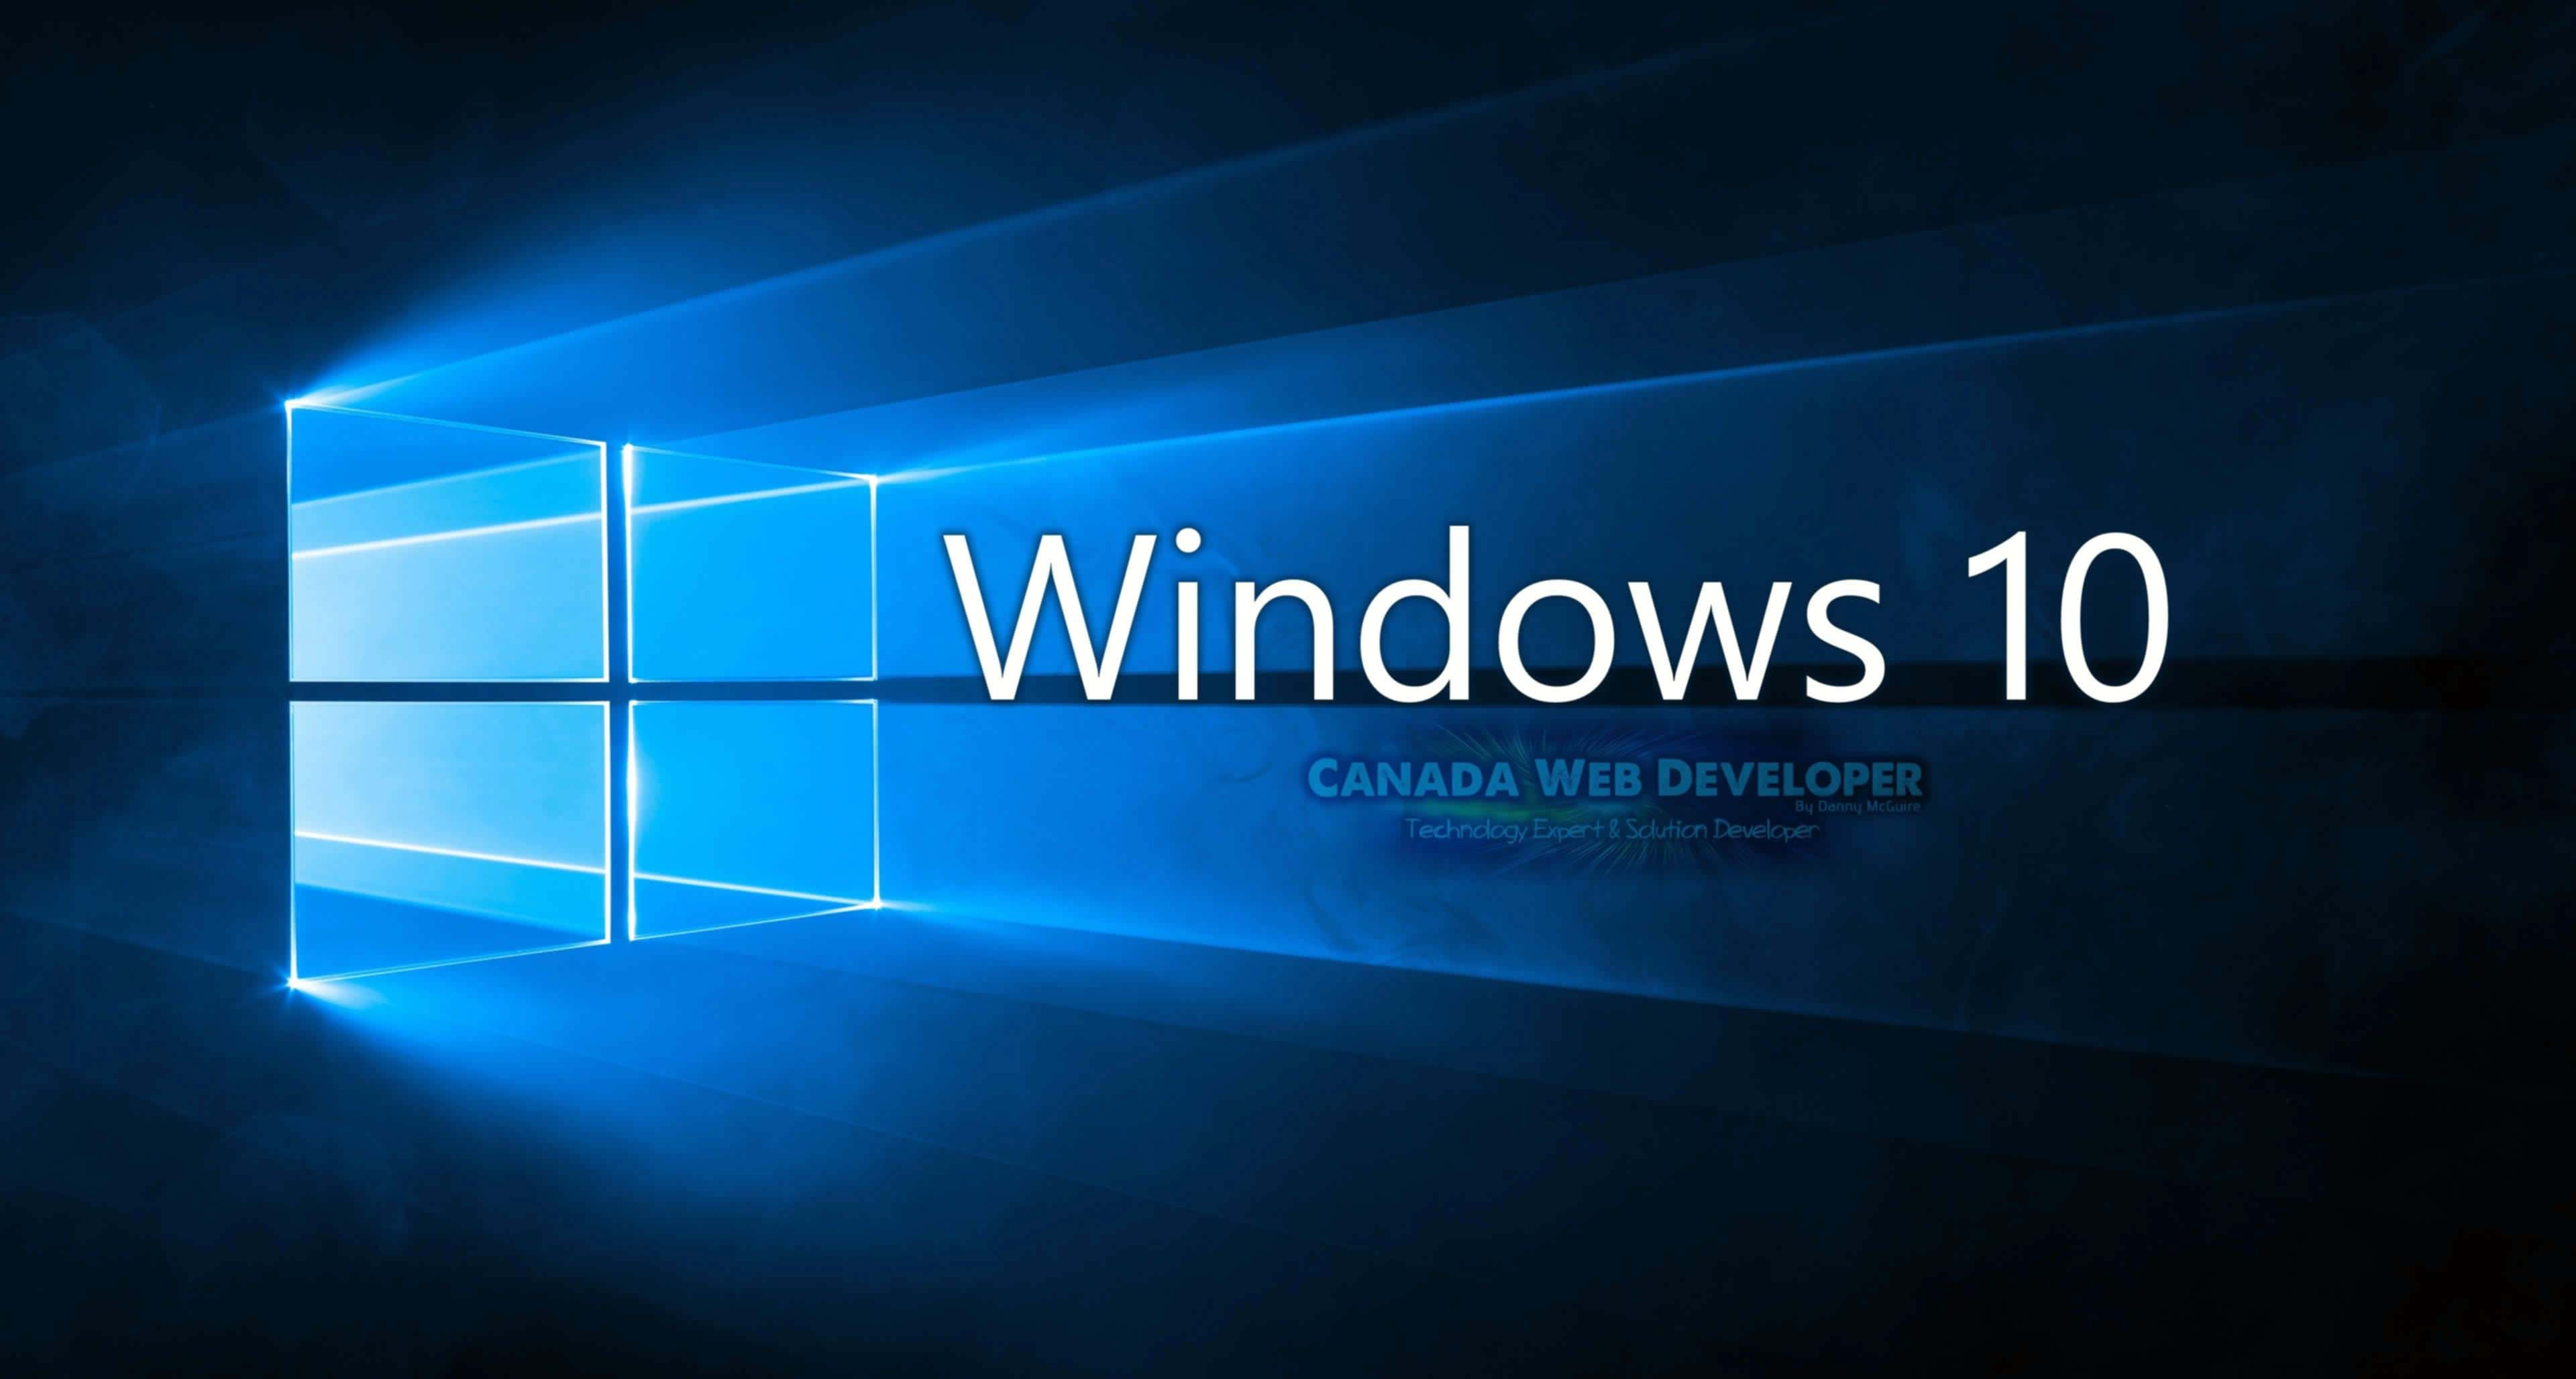 top 10 windows 10 hd wallpapers for desktop | wallpapers ultra hd